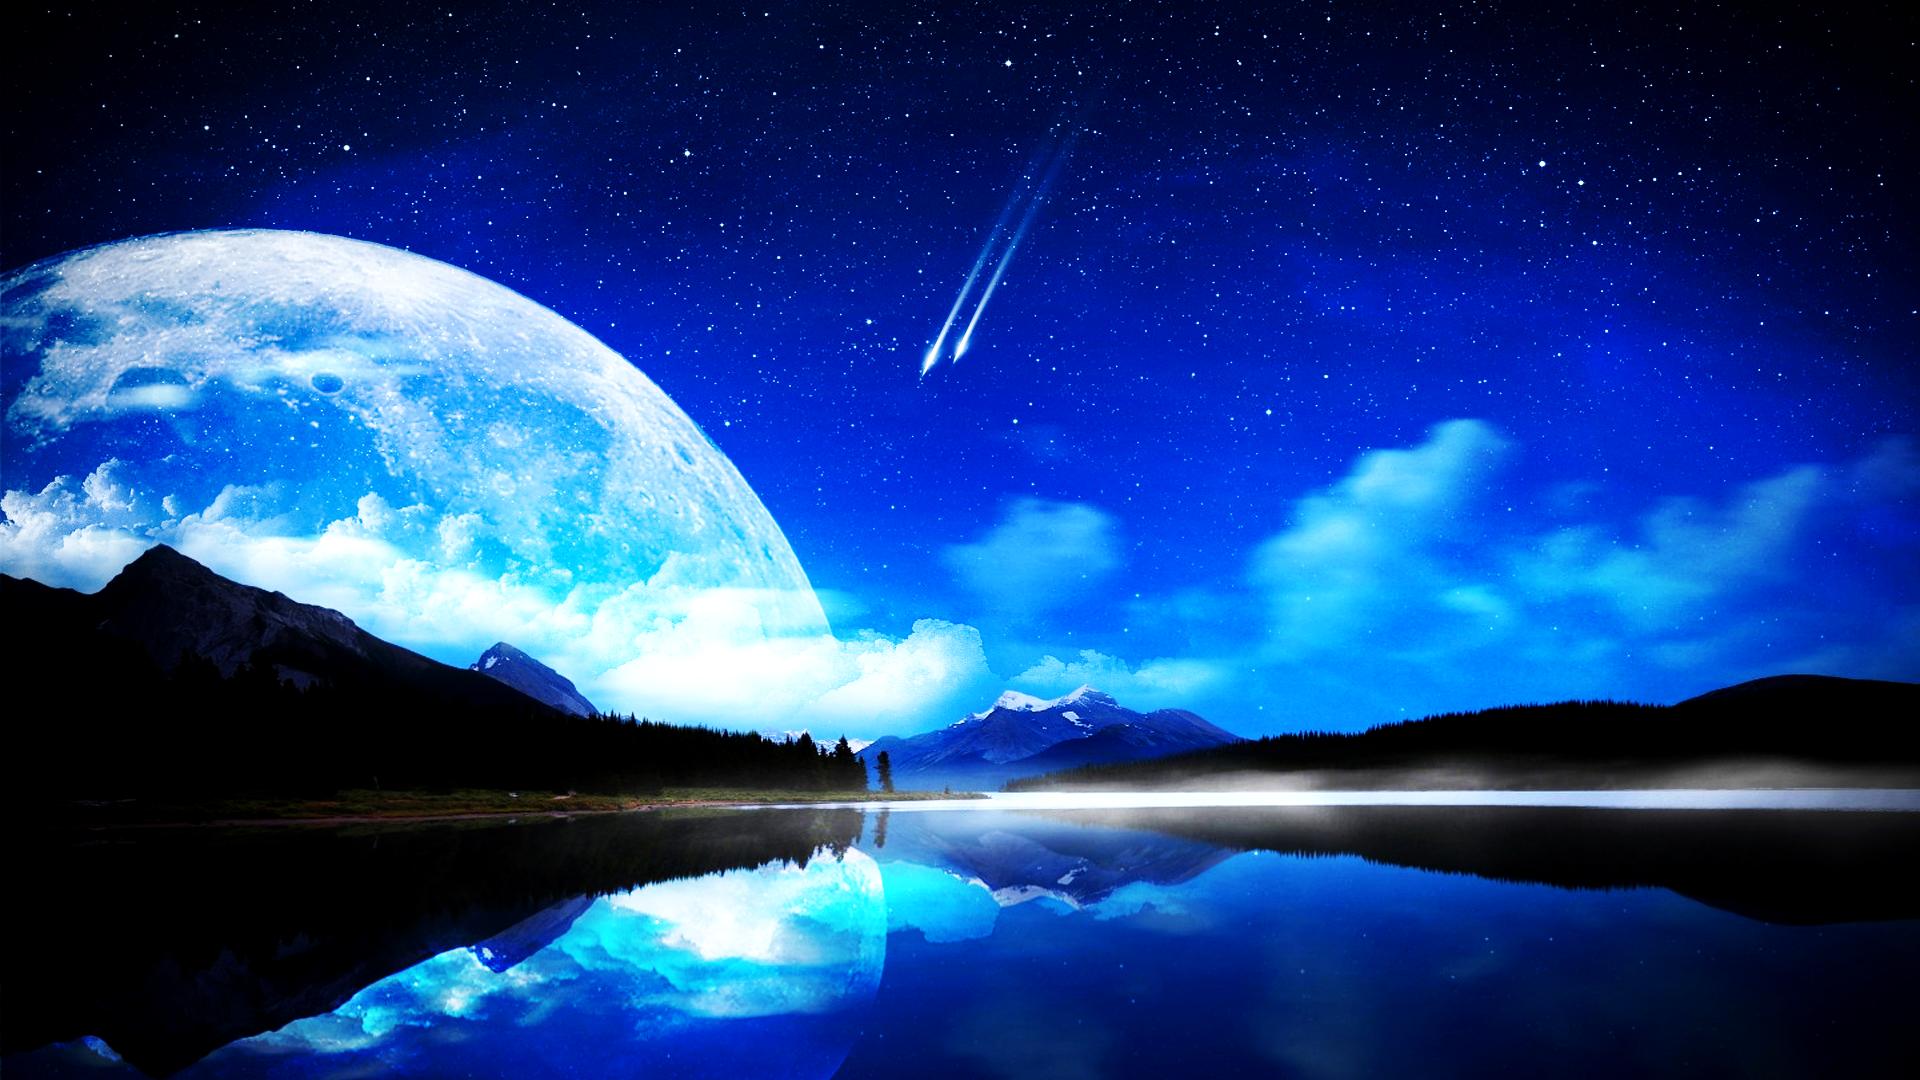 Crescent Moon Wallpaper Full Hd - Blue Moon Wallpaper Hd , HD Wallpaper & Backgrounds